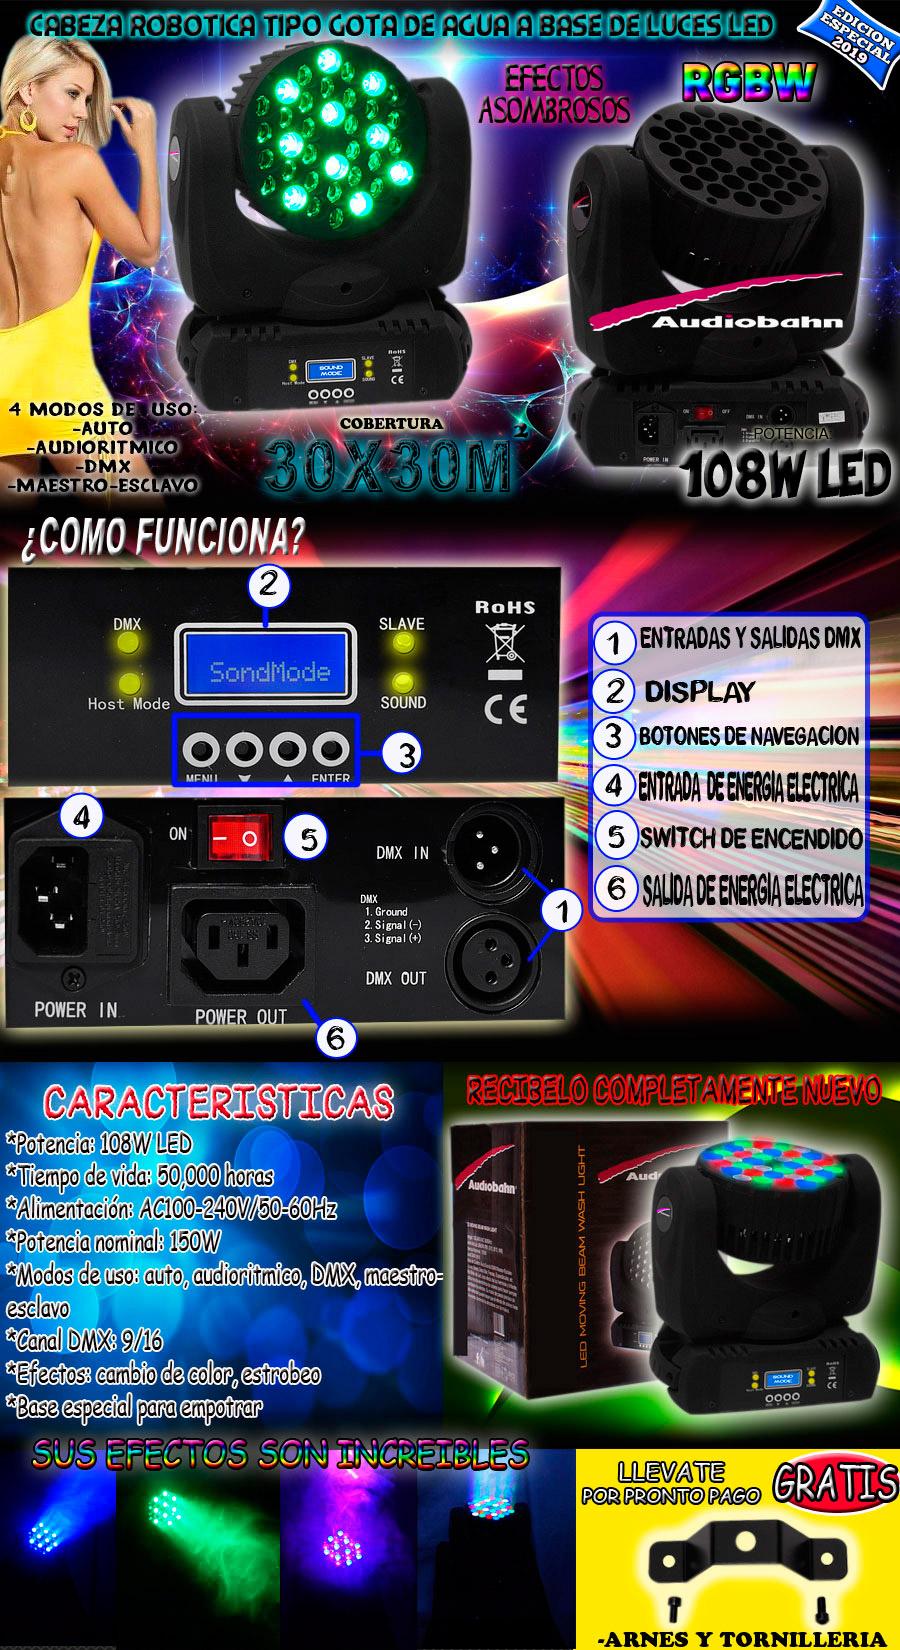 http://lomejorenvideo.com/img-van/cabeza-robotica-audiobahn/principal.jpg